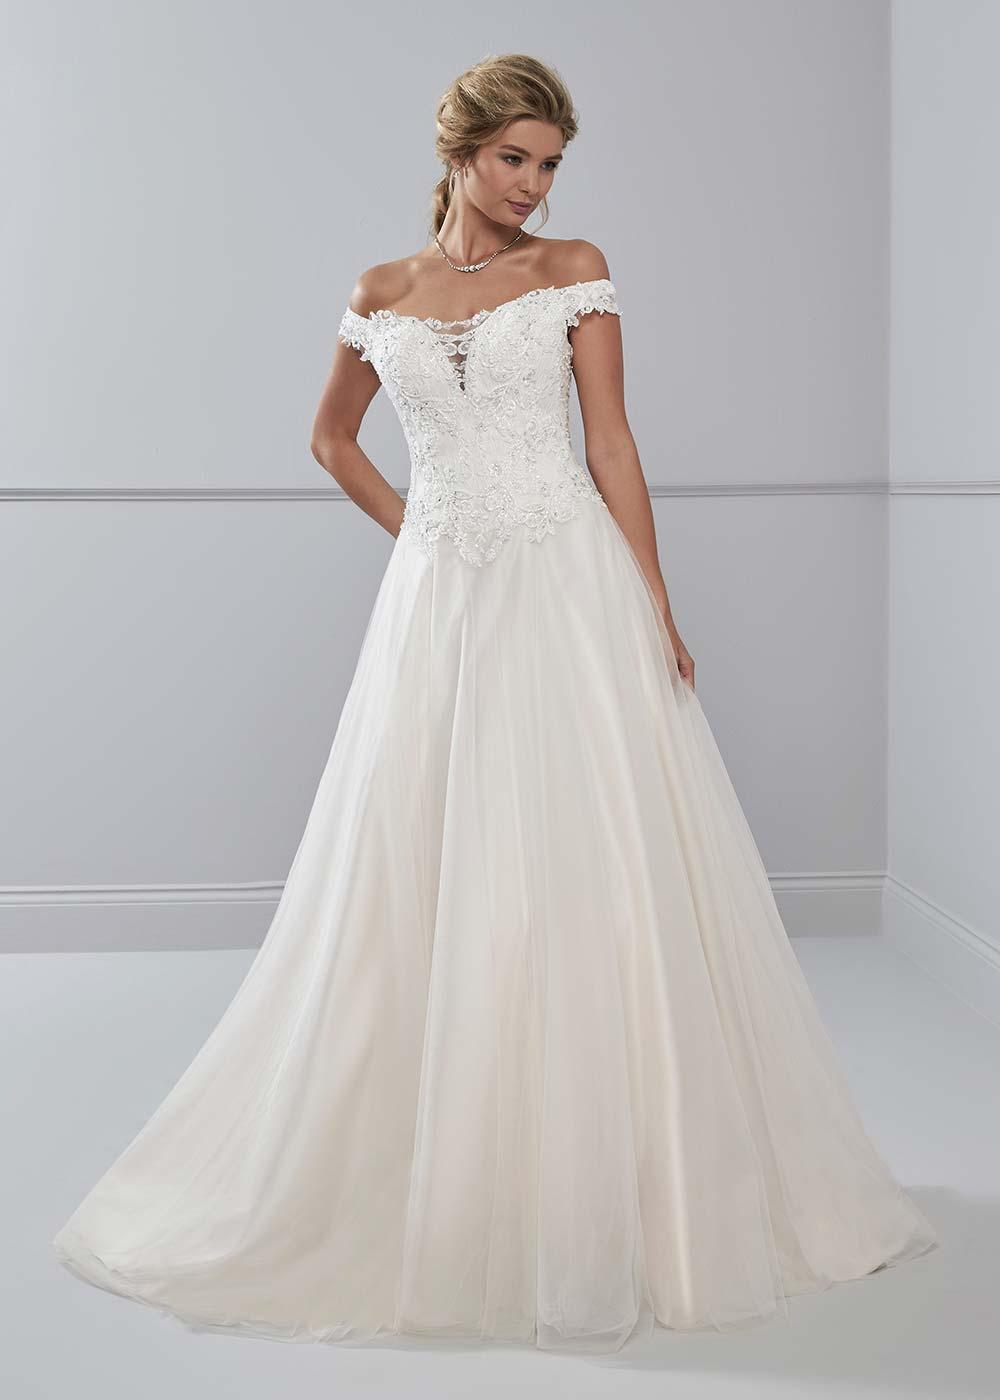 cdaf4c66e5ed ... Caroline Clark Bridal - Bridal Boutique - Worcestershire ...